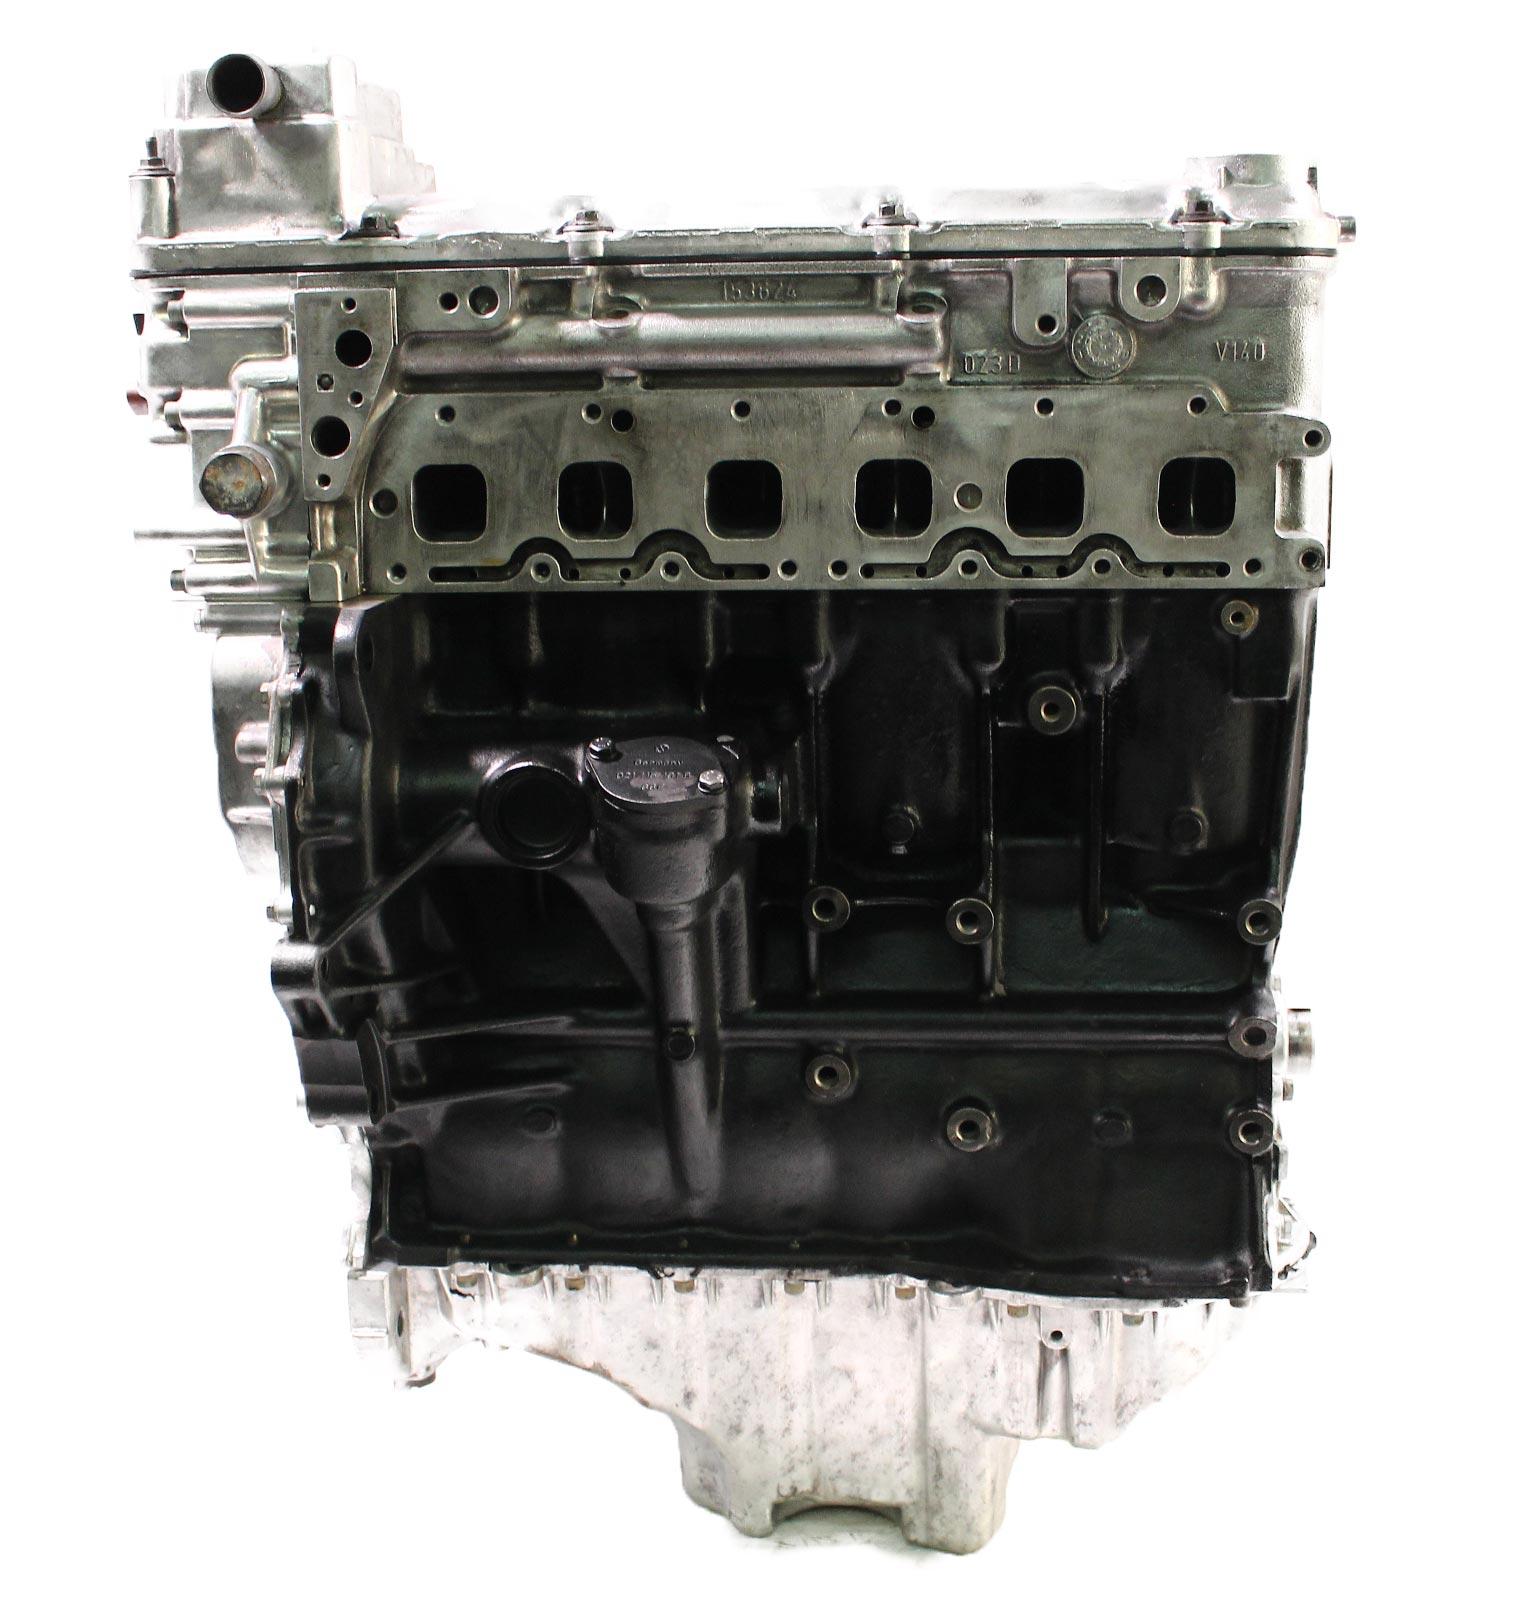 Motor 2004 VW Touareg 7LA 7L6 3,2 V6 AZZ 220 PS Kettensatz ZKD Neu Kopf geplant